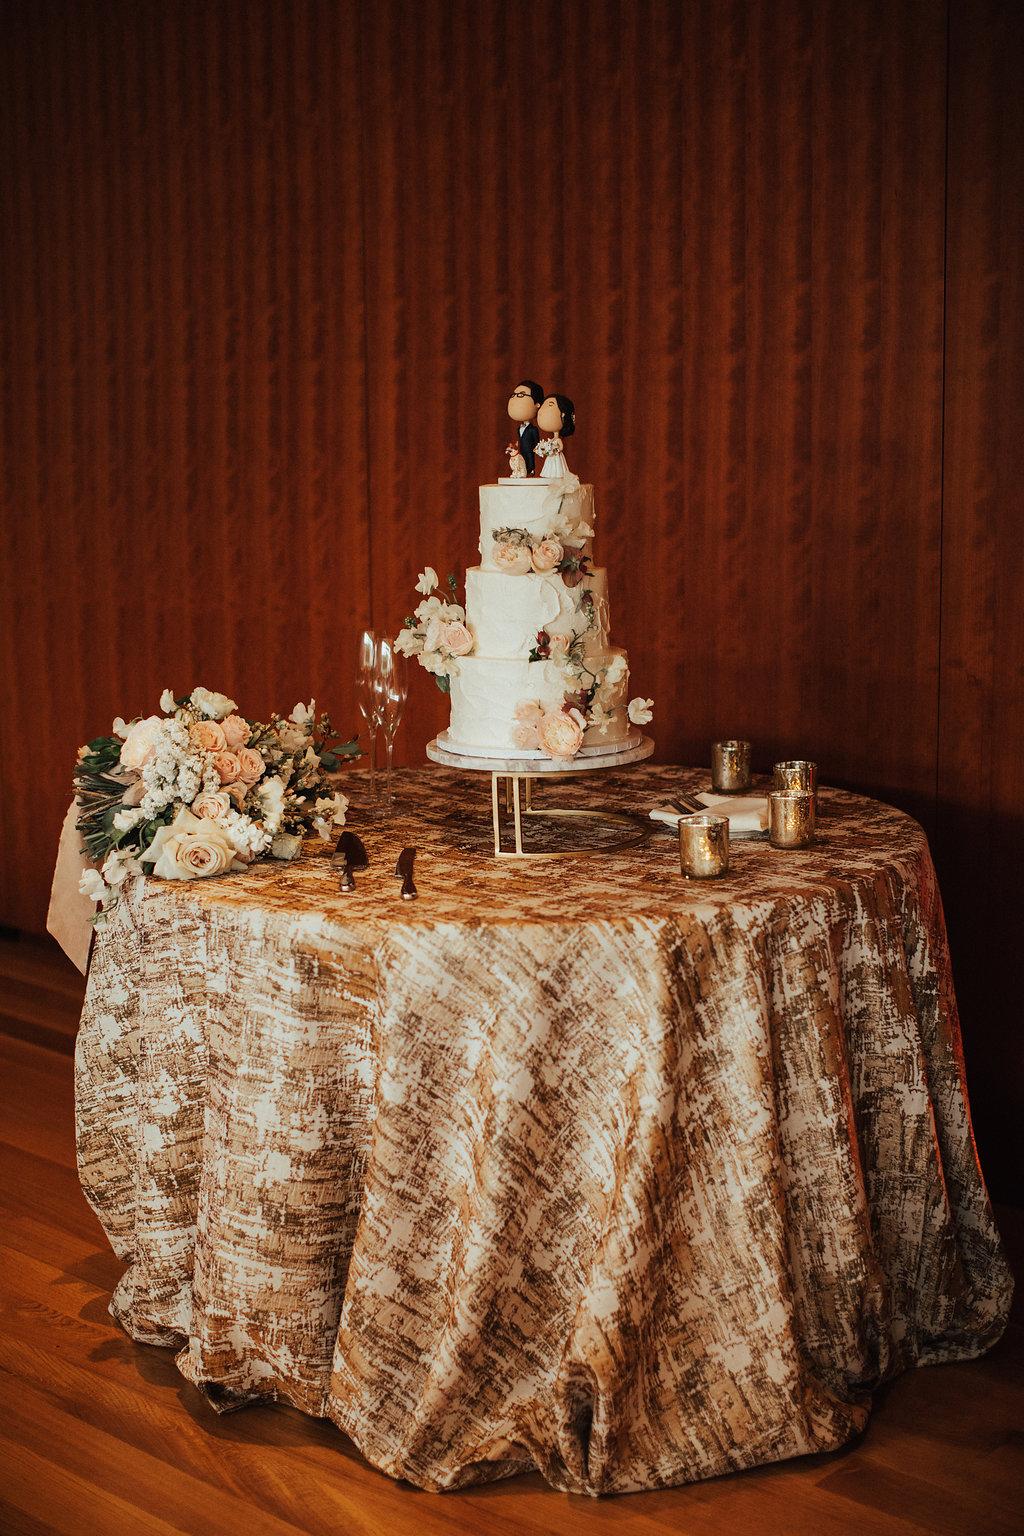 Modern Wedding Cake with Flowers   Whisk Bakery